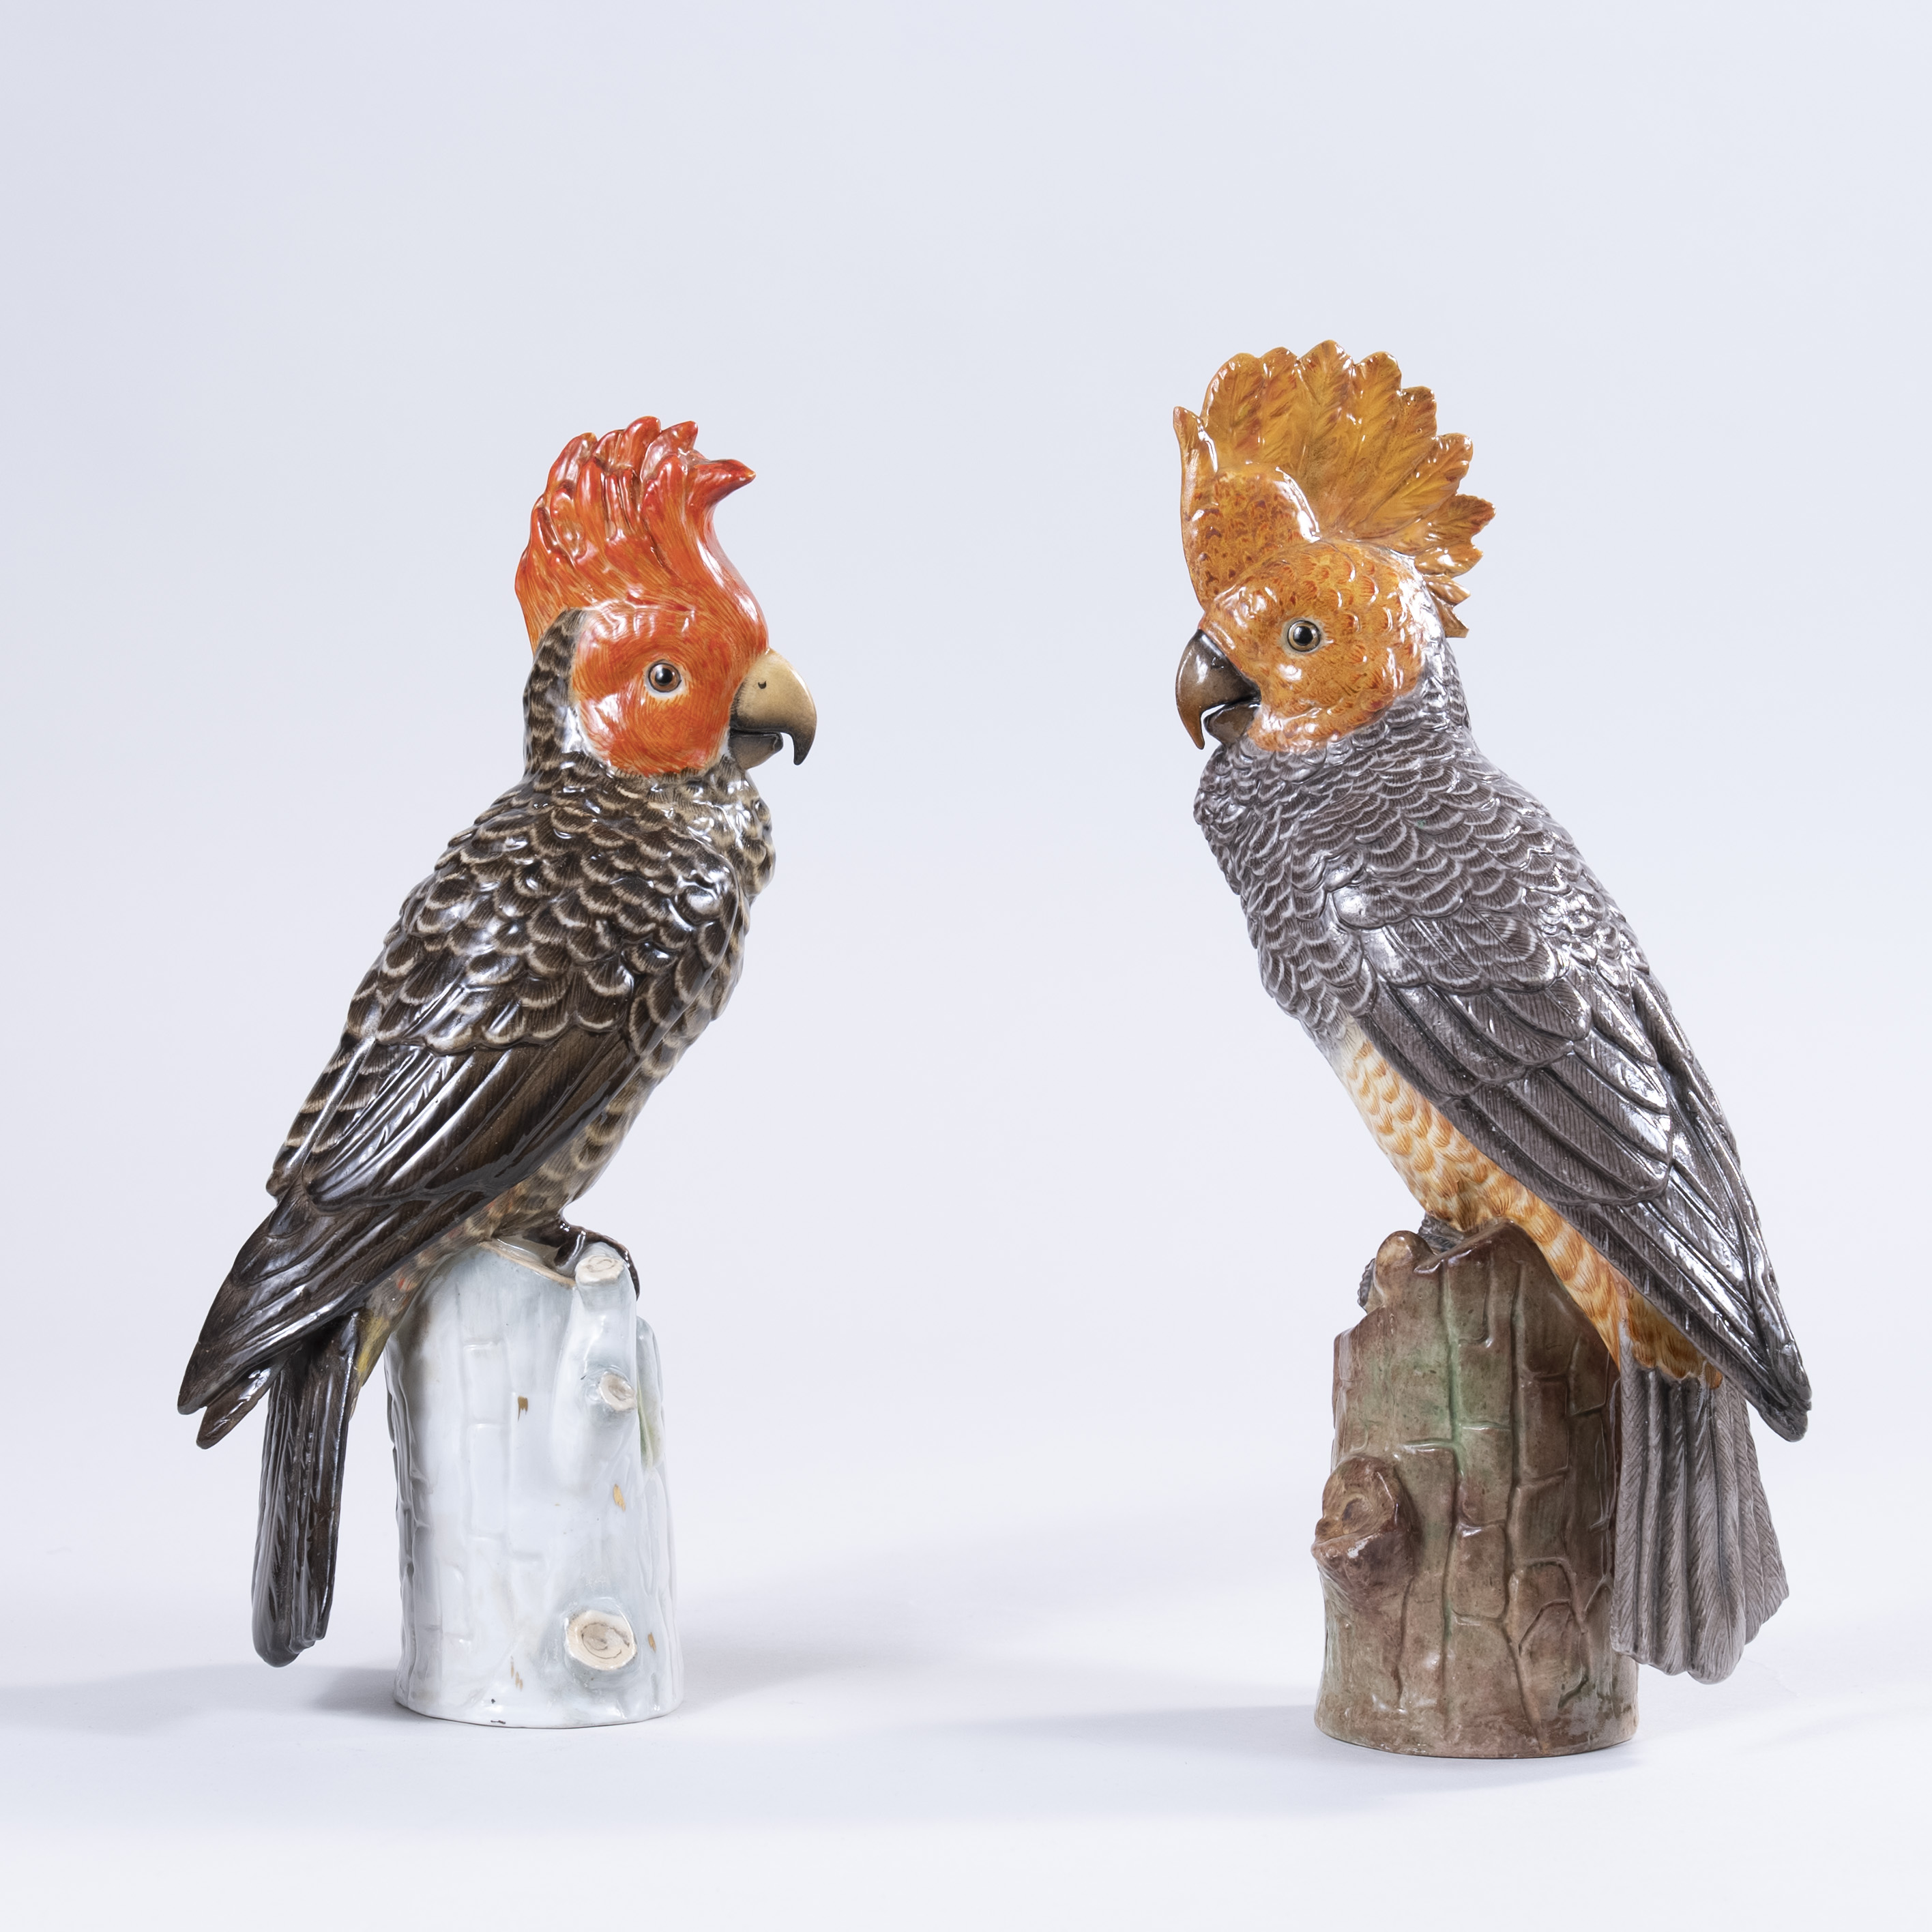 Late 19th Century Pair of German Porcelain Parrots, circa 1880